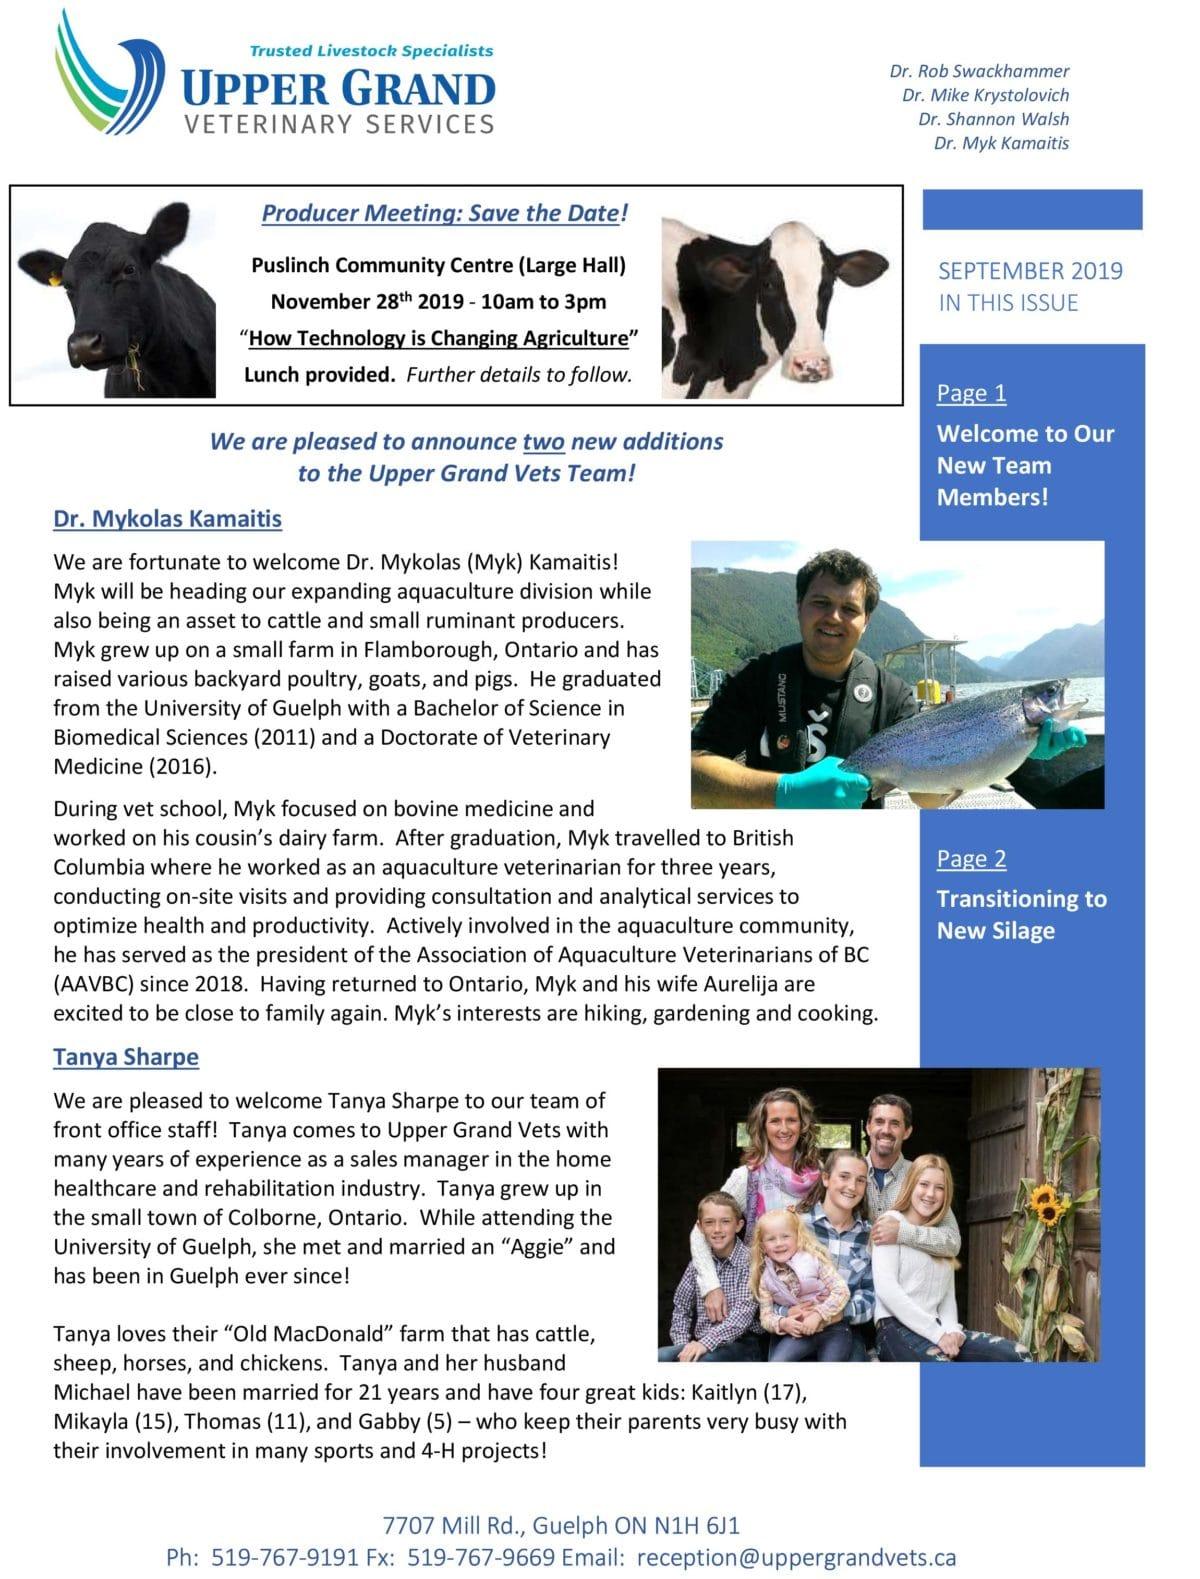 UGVS-Newsletter_Sept-2019-1-copy-1200x1579.jpg